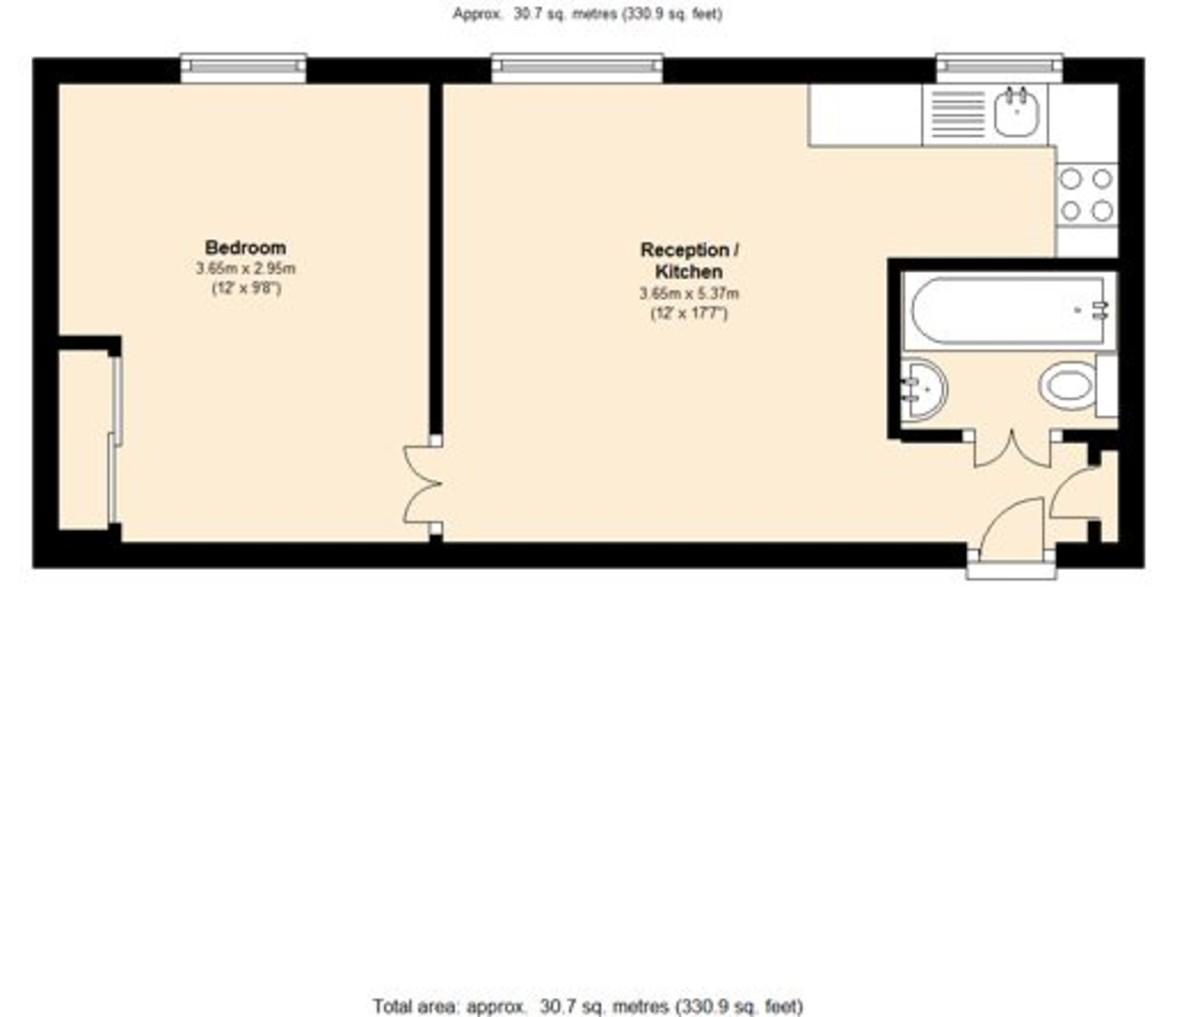 Abercorn Place, St Johns Wood, London, NW8 Floorplan